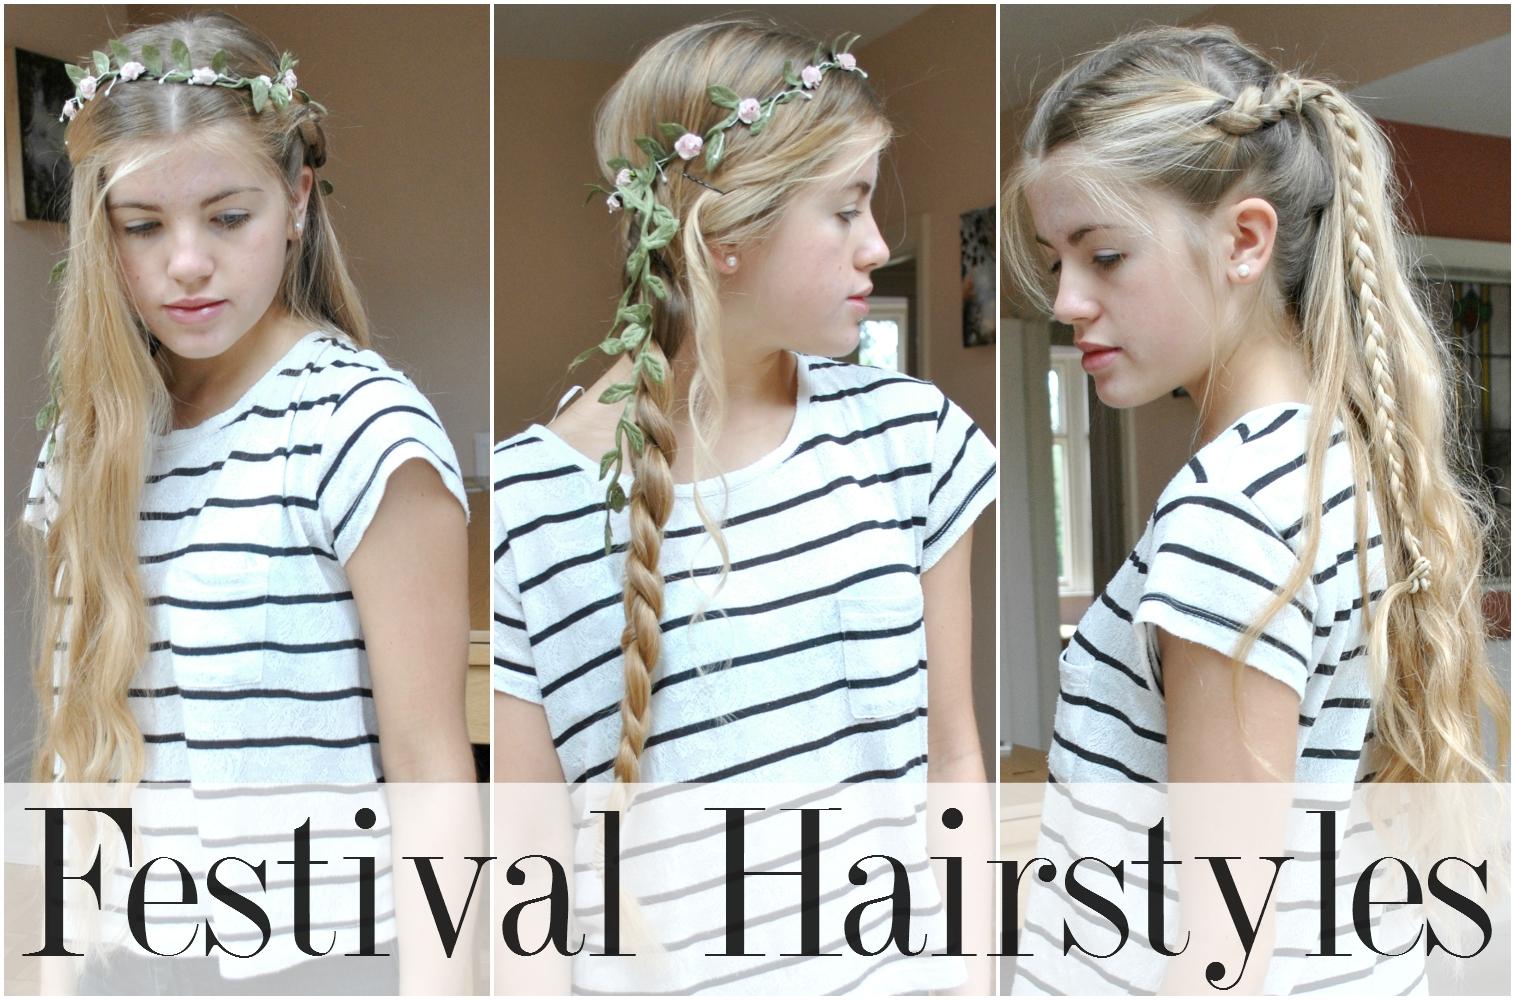 Joie De Jodie 1 Minute Festival Hairstyles